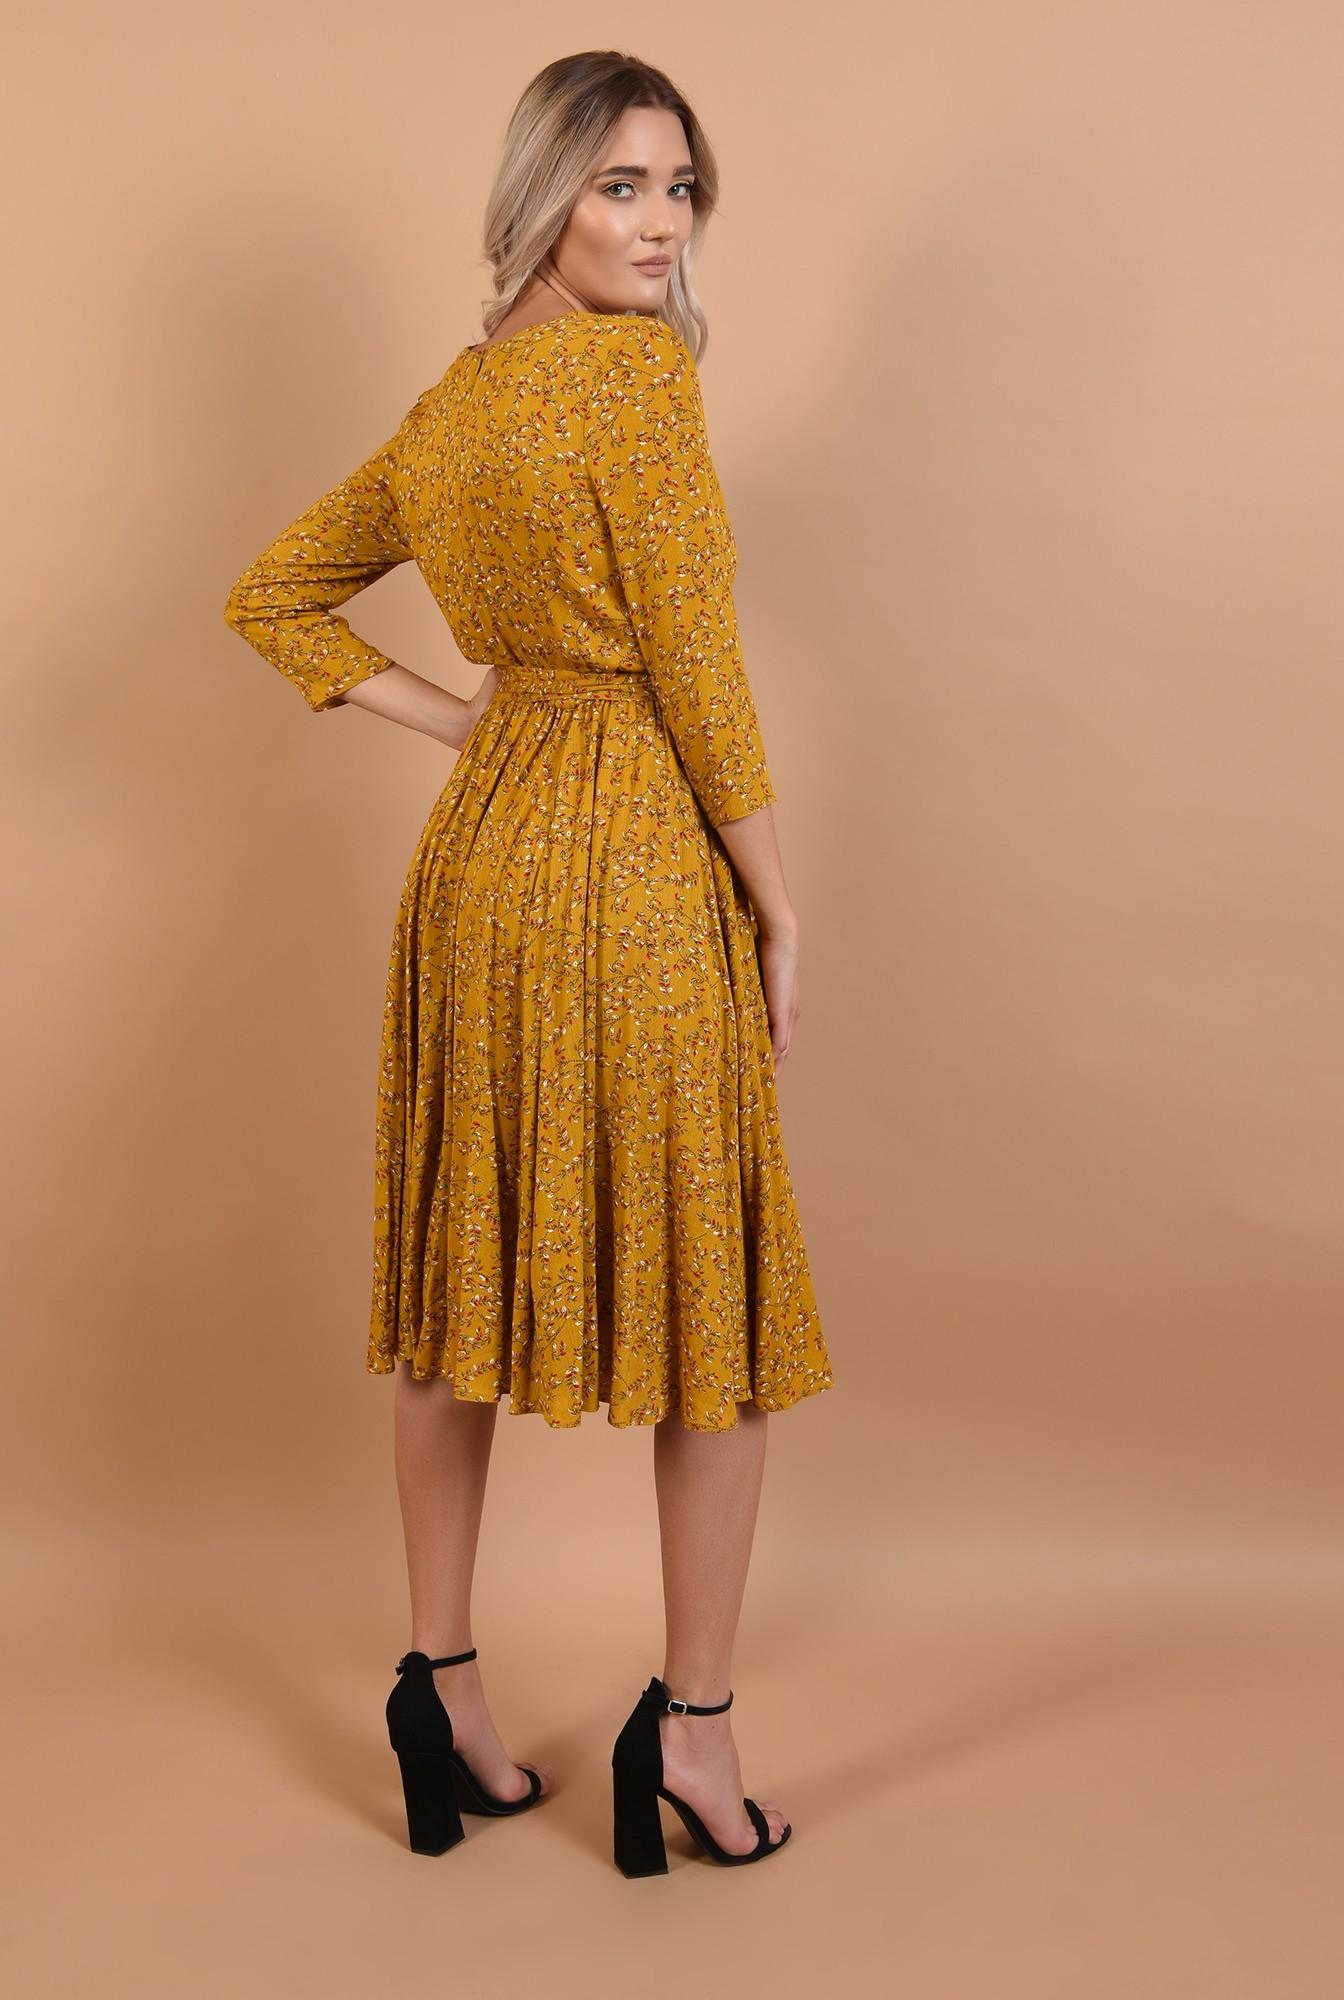 1 - 360 - rochie de toamna, imprimeu floral, mustar, cu cordon, decolteu in V